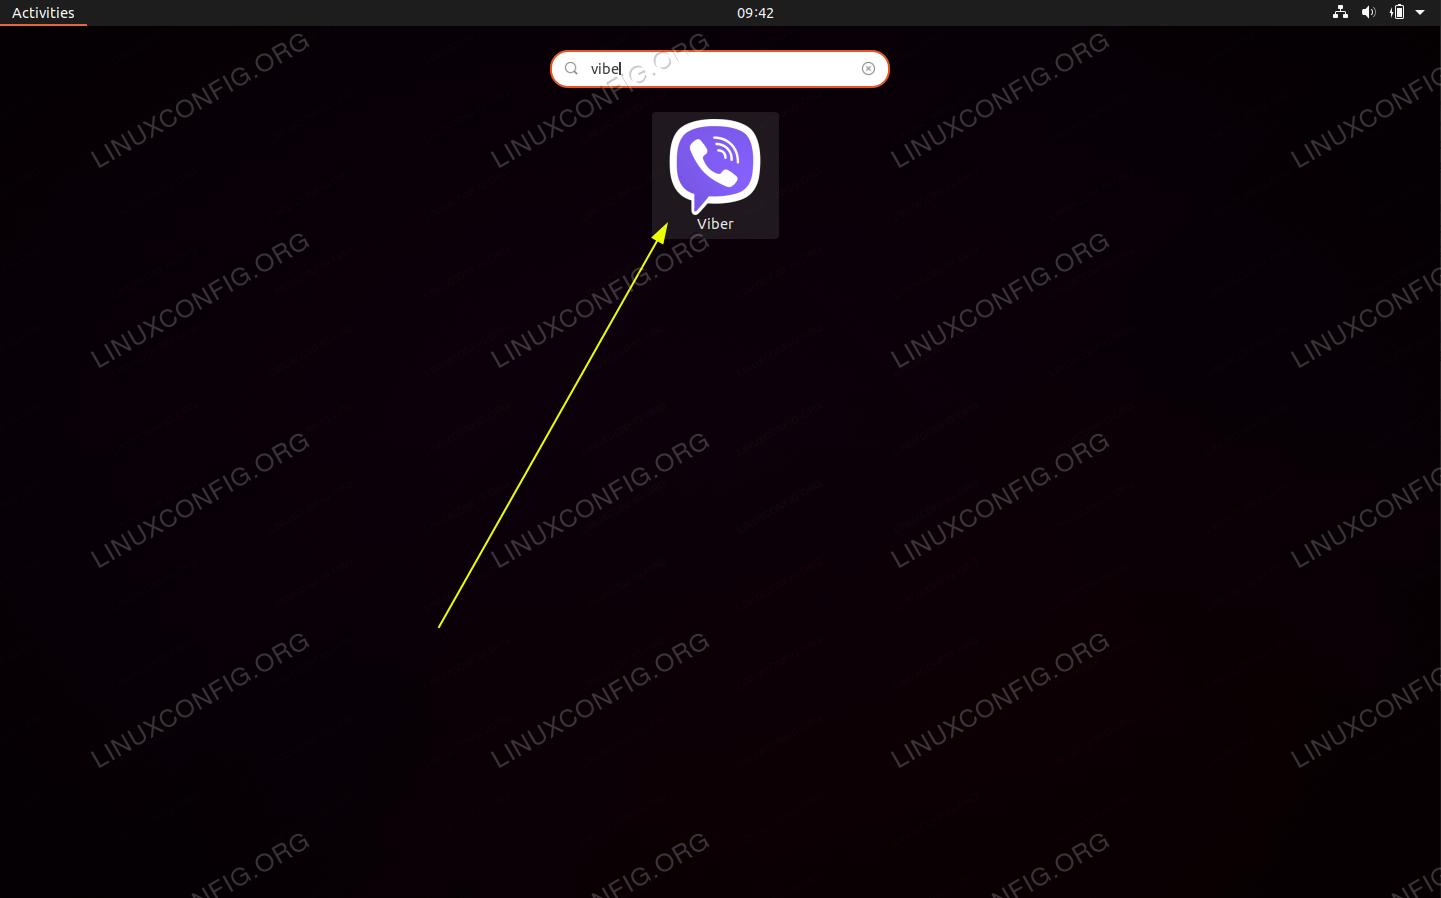 Use Activities menu to search and start Viber on your Ubuntu 20.04 desktop.